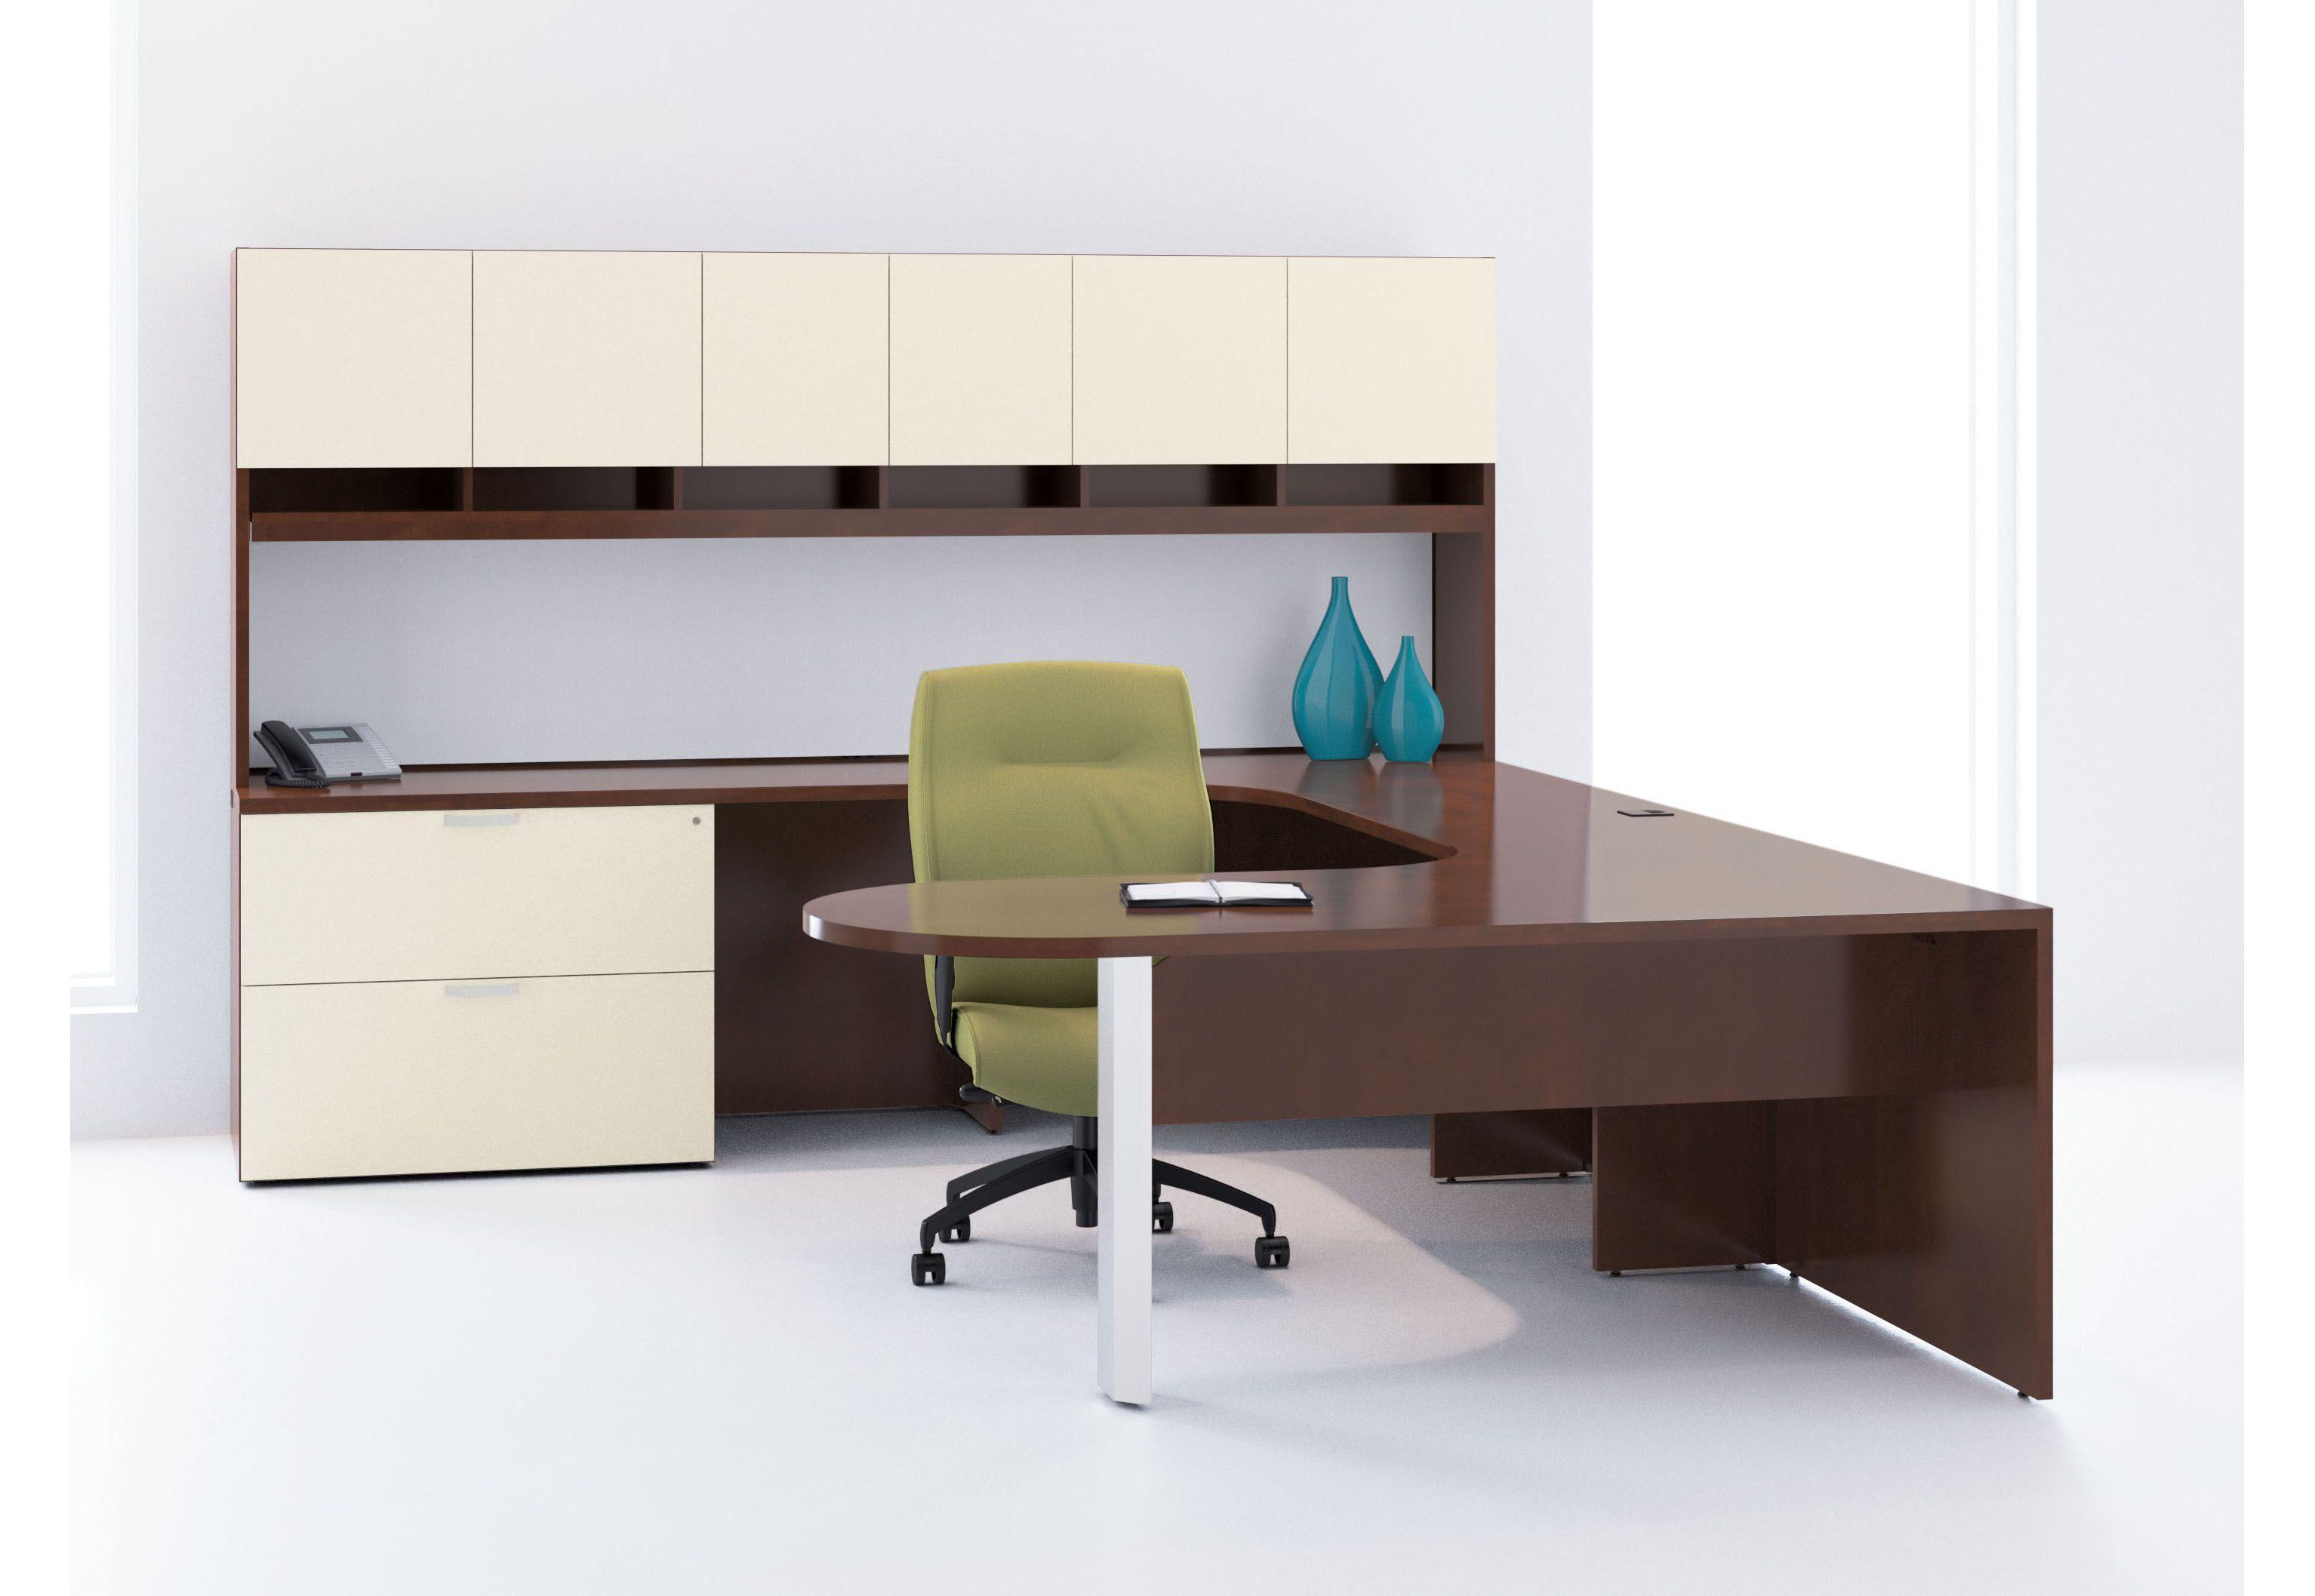 Quaranta 5 Bureel #Fantoni #Burovorm - Office Furniture - Pinterest